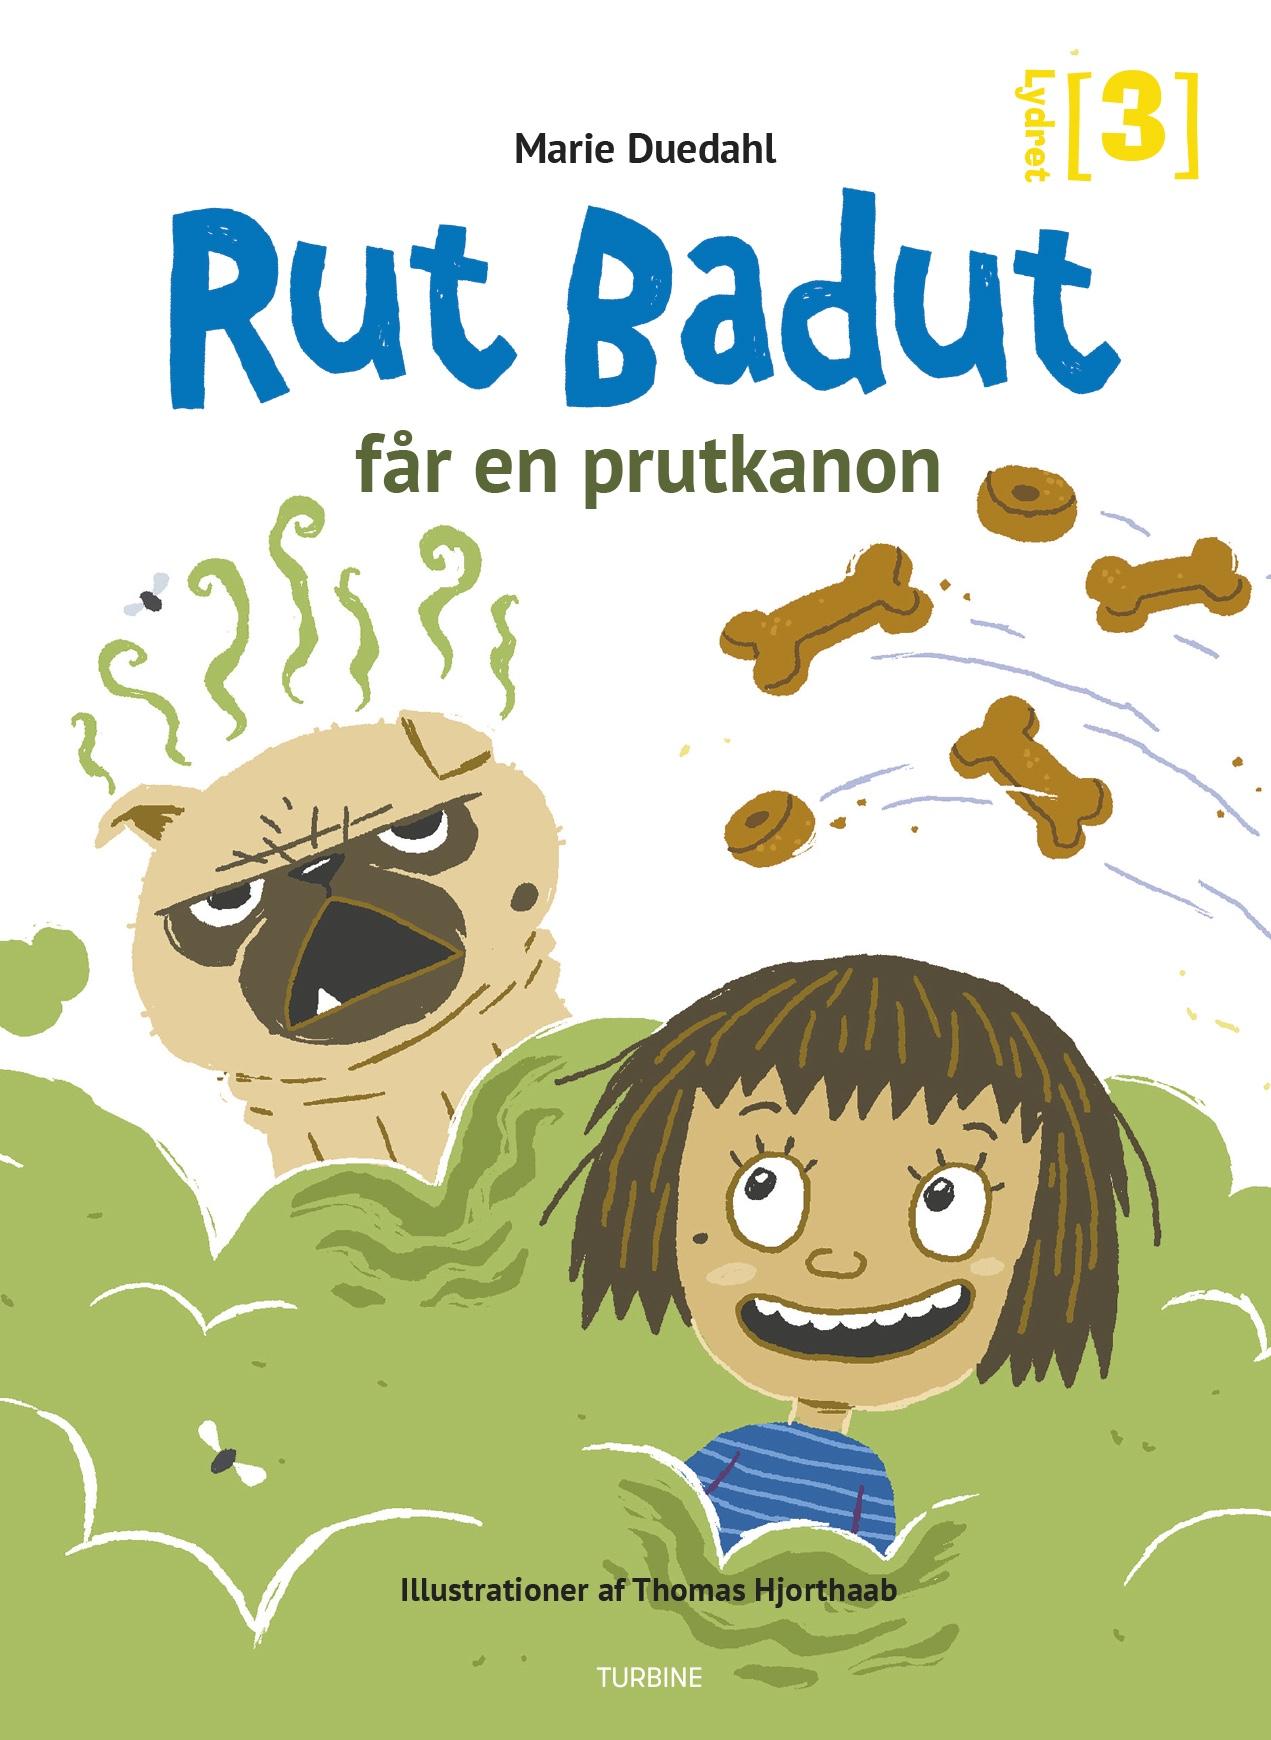 Lydret: Rut Badut får en prutkanon - Marie Duedahl - Bøger - Turbine - 9788740658989 - January 29, 2020